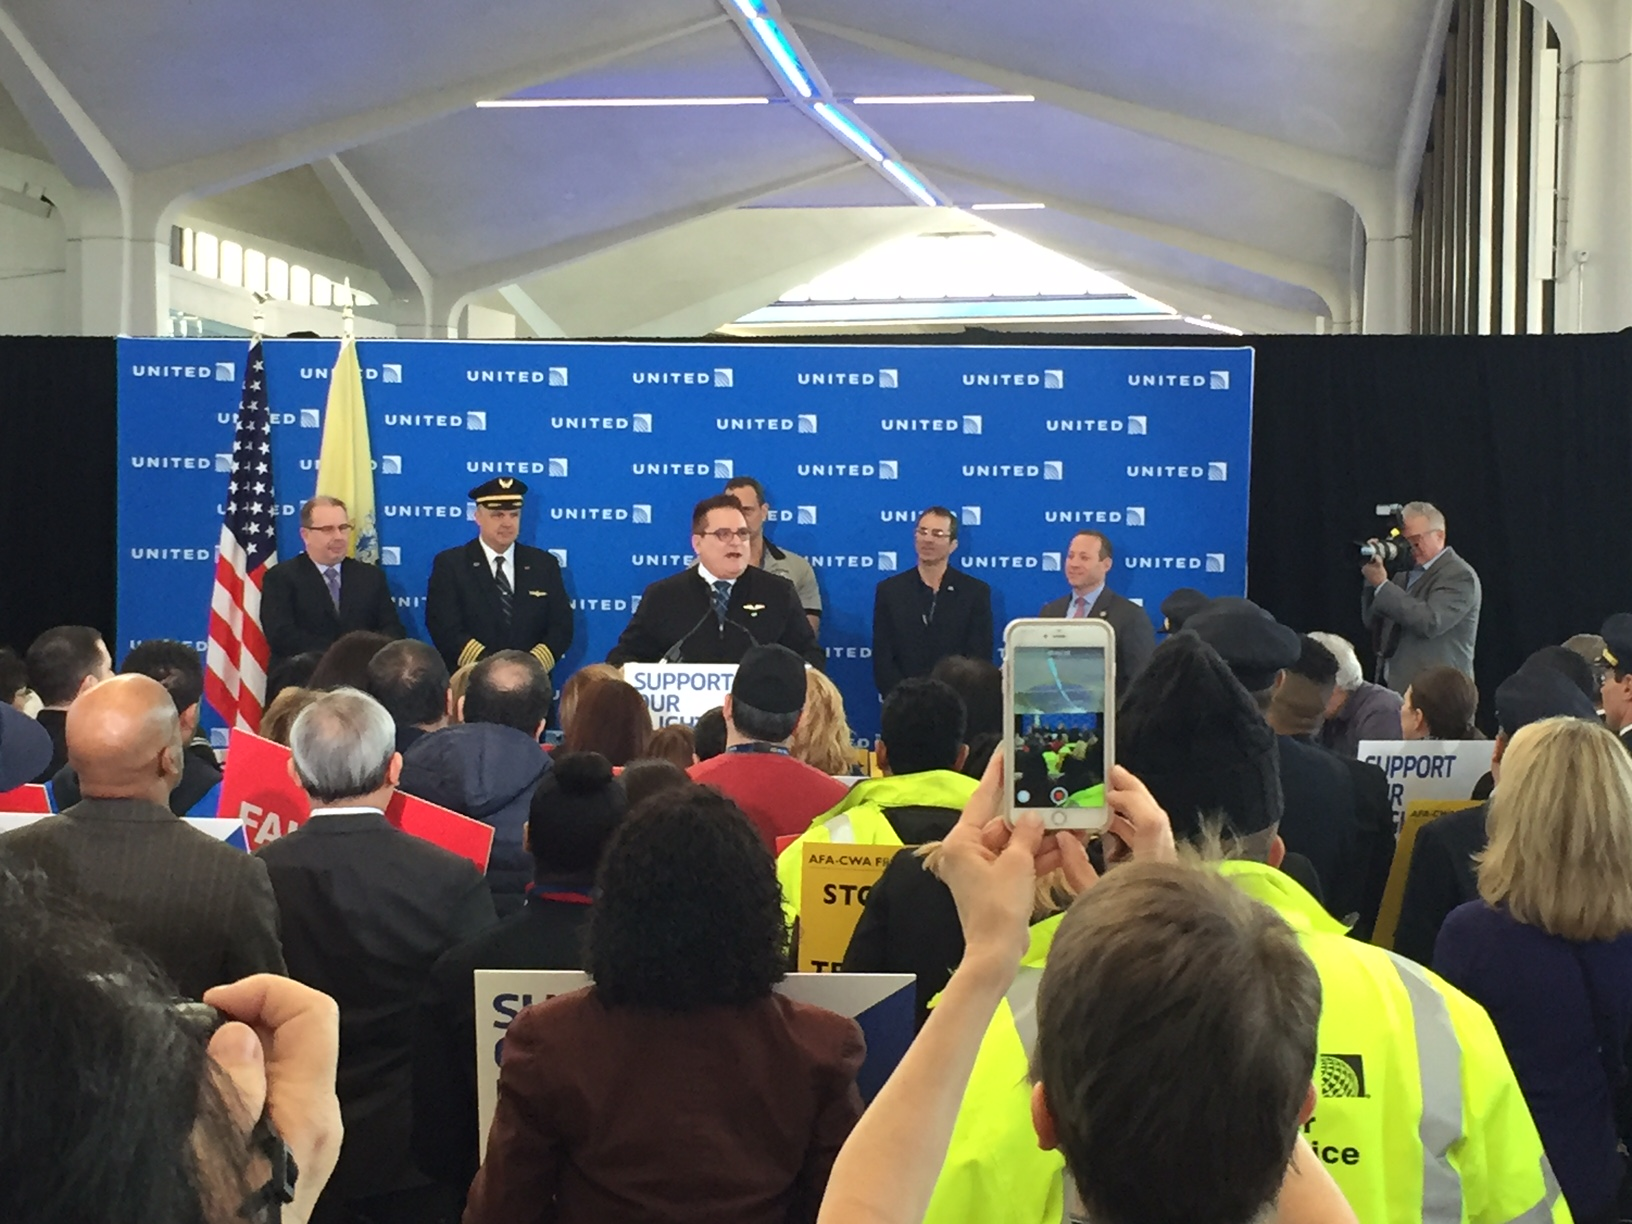 AFA Rallies at EWR for U S  Aviation Jobs - Association of